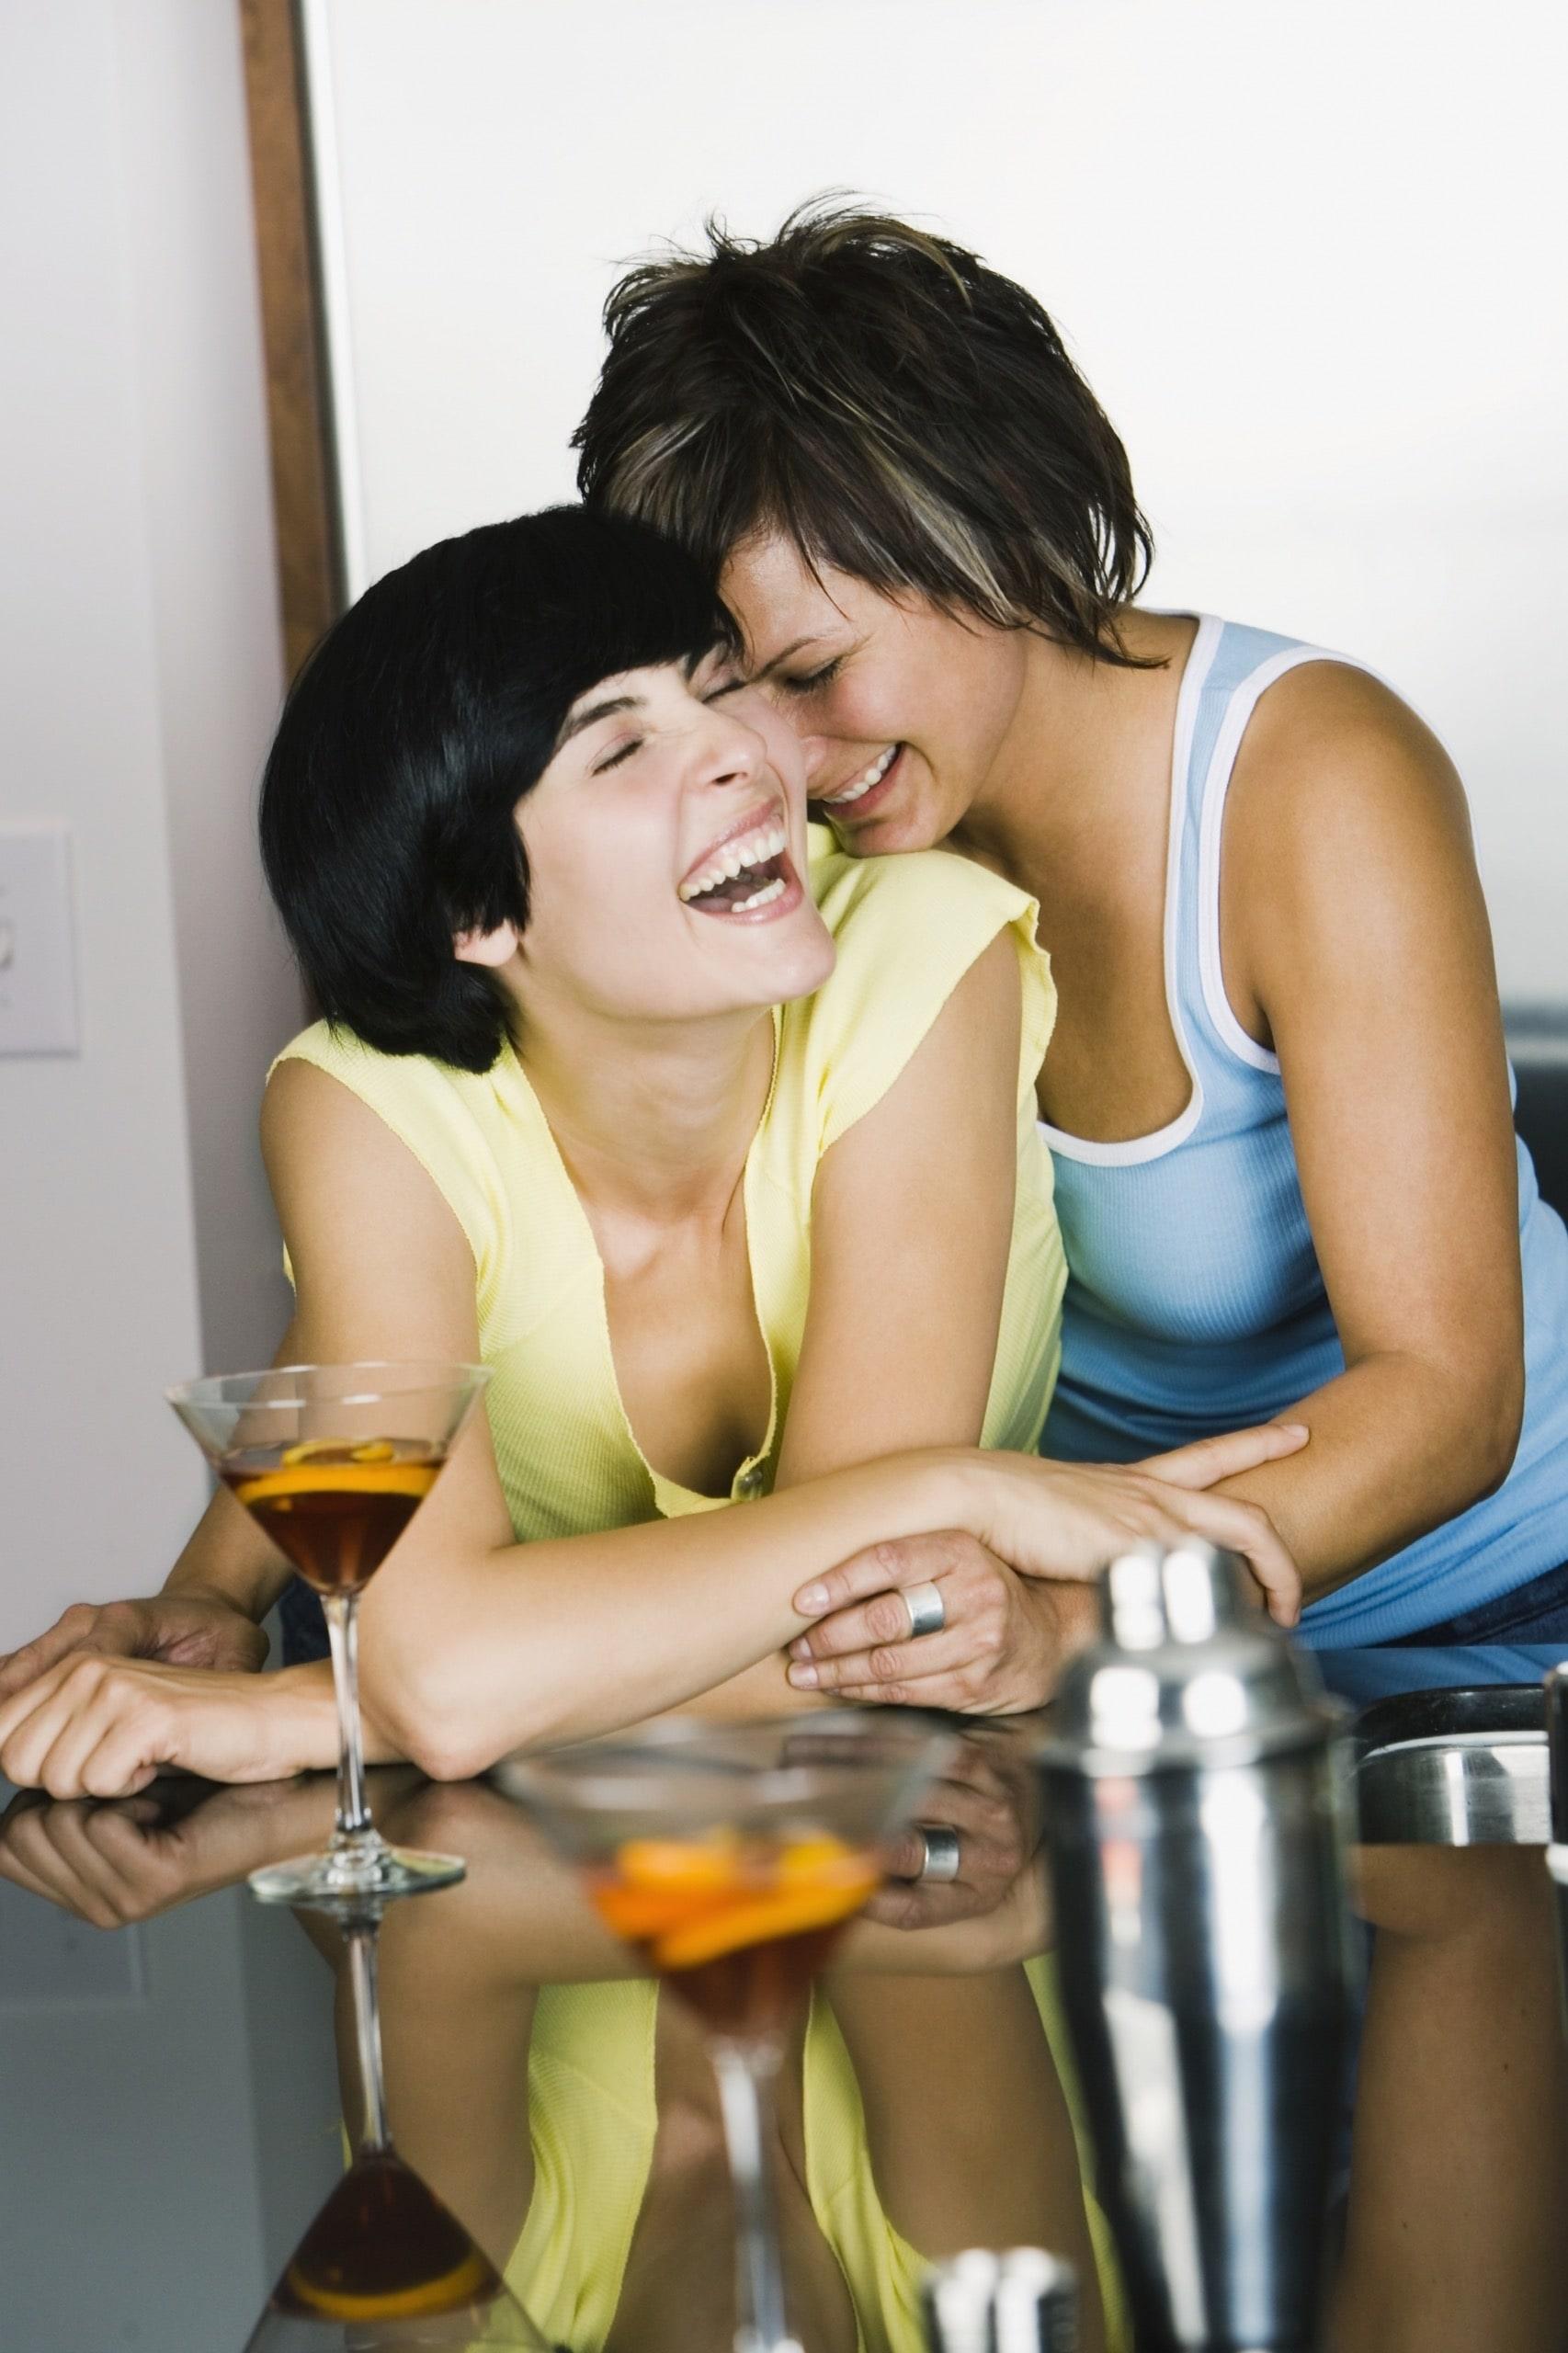 Lovely lesbian couple